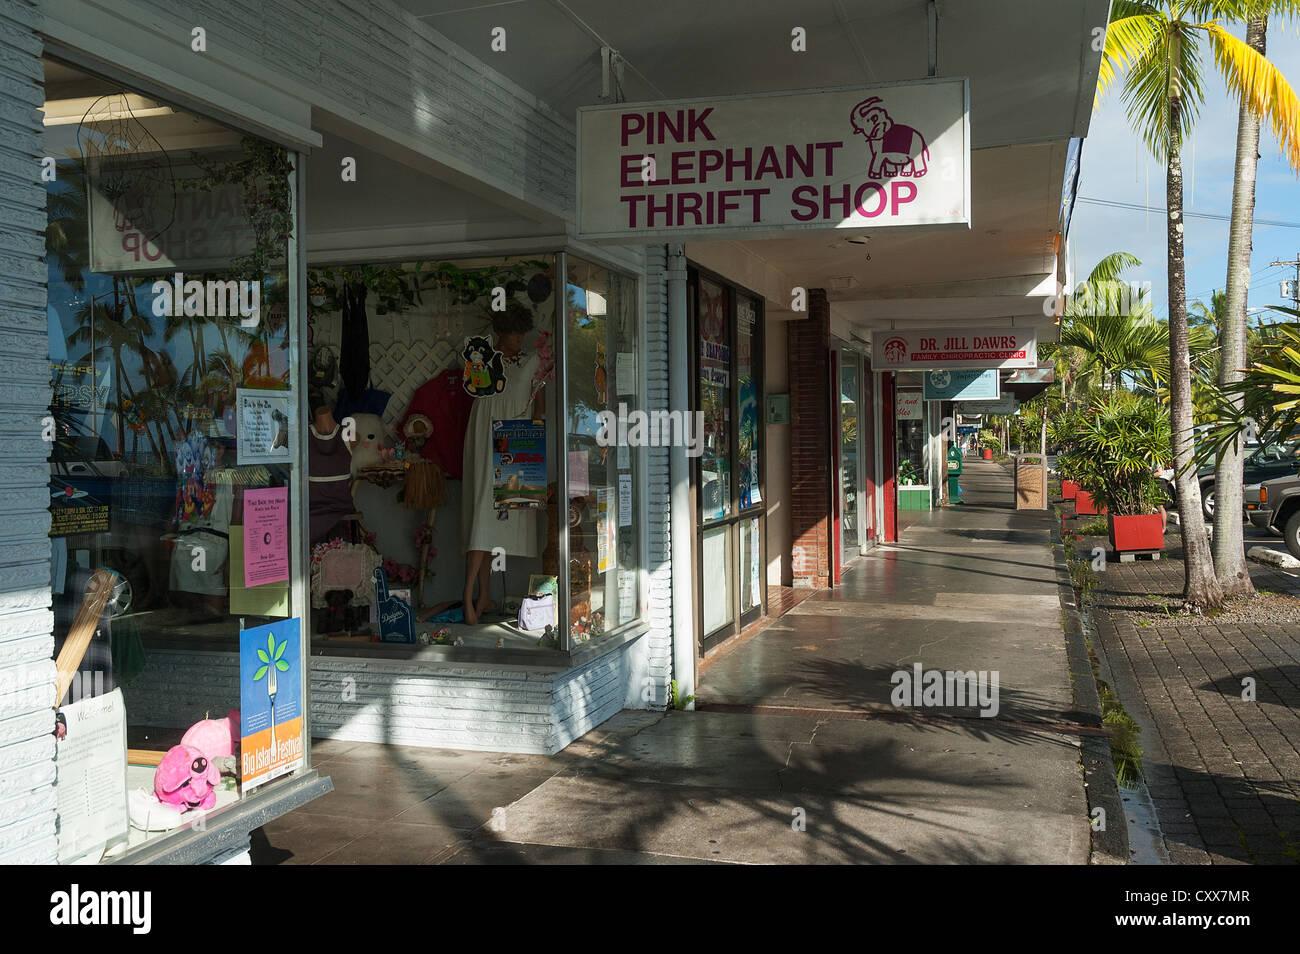 Elk284-2029 Hawaii, Hilo, downtown street scene - Stock Image